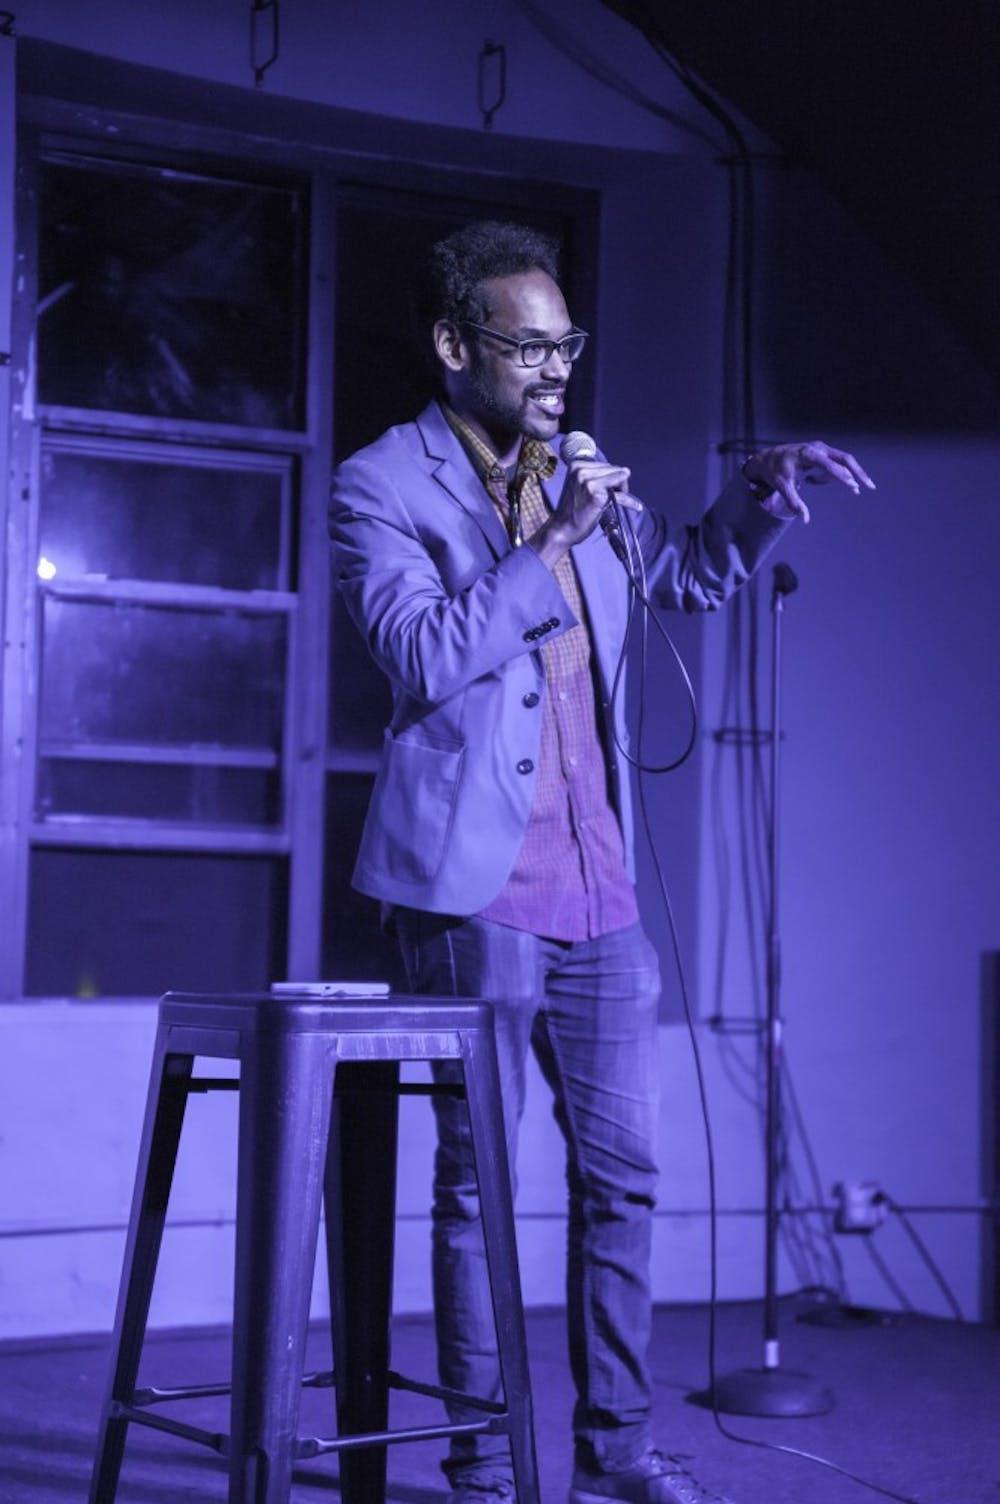 wbrs-comedy-night-2-1-18-knd0317